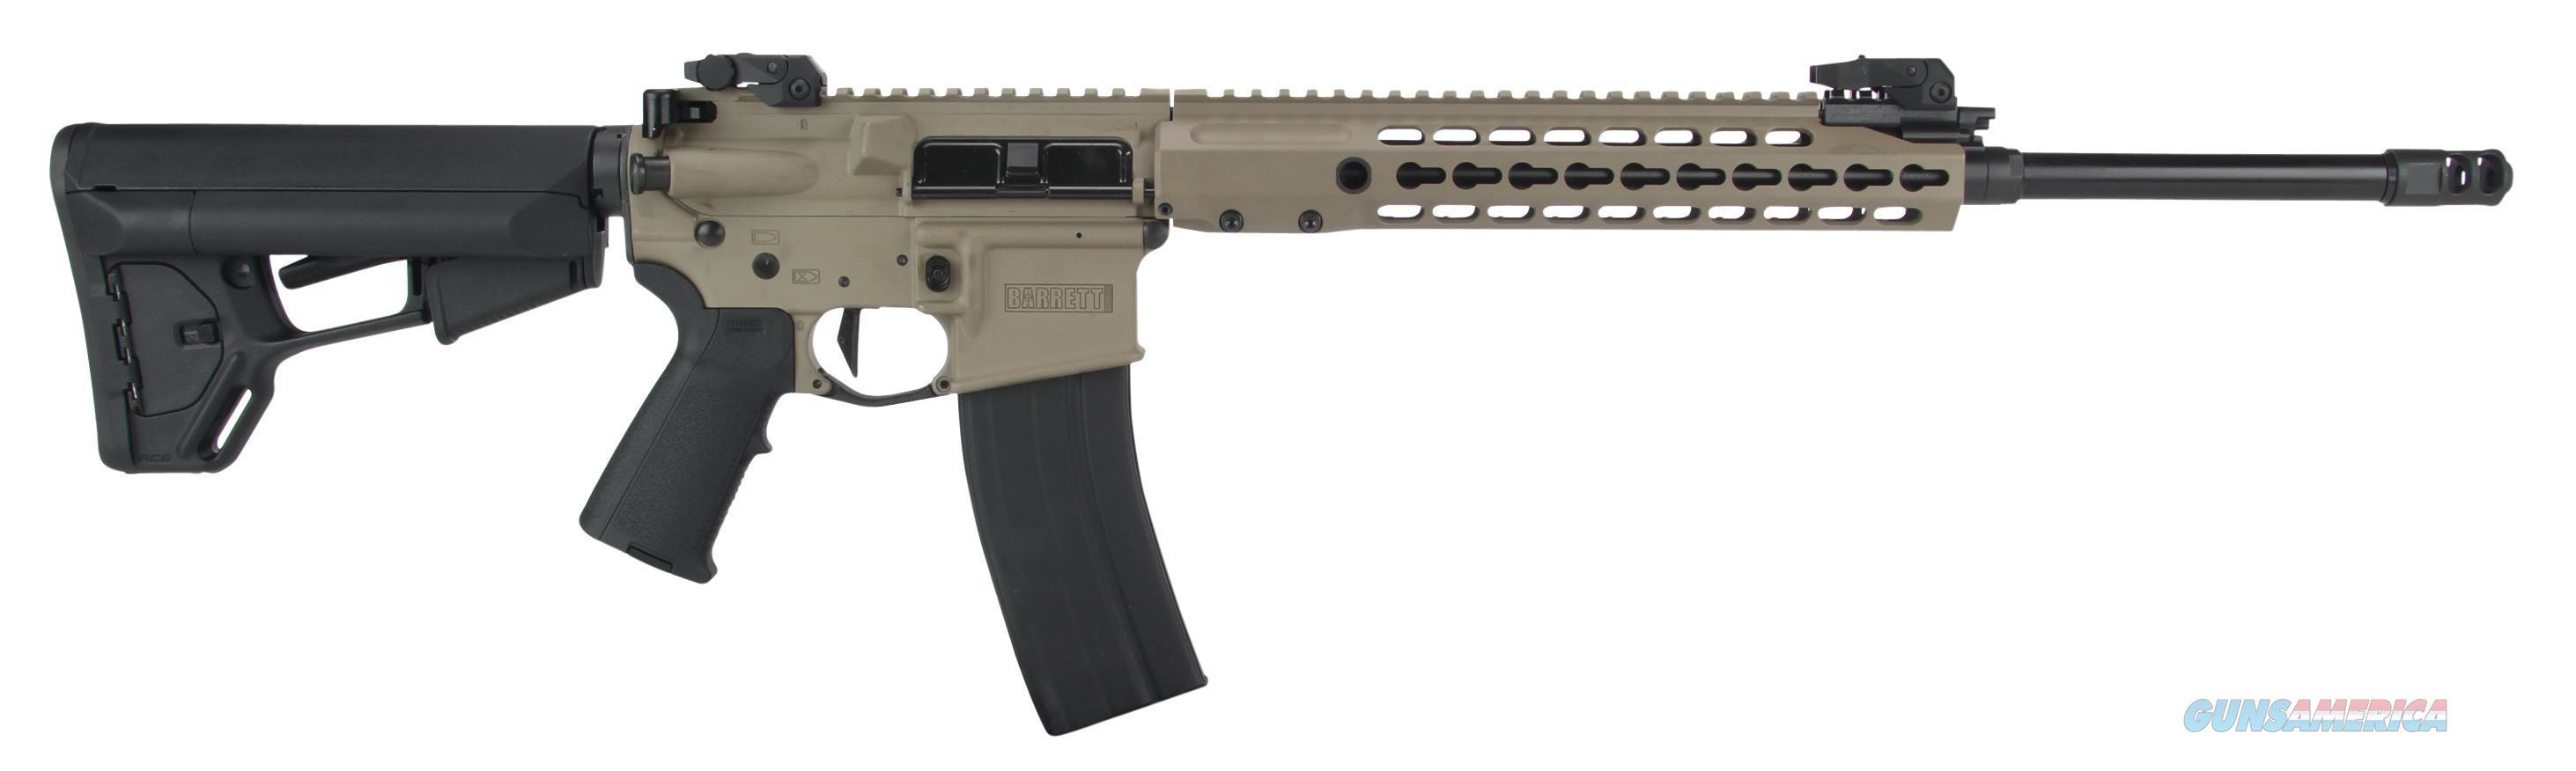 "Barrett 14953 Rec 7 Gen Ii Semi-Automatic 223 Remington/5.56 Nato 18.0"" 30+1 Mag 14953  Guns > Rifles > Barrett Rifles"